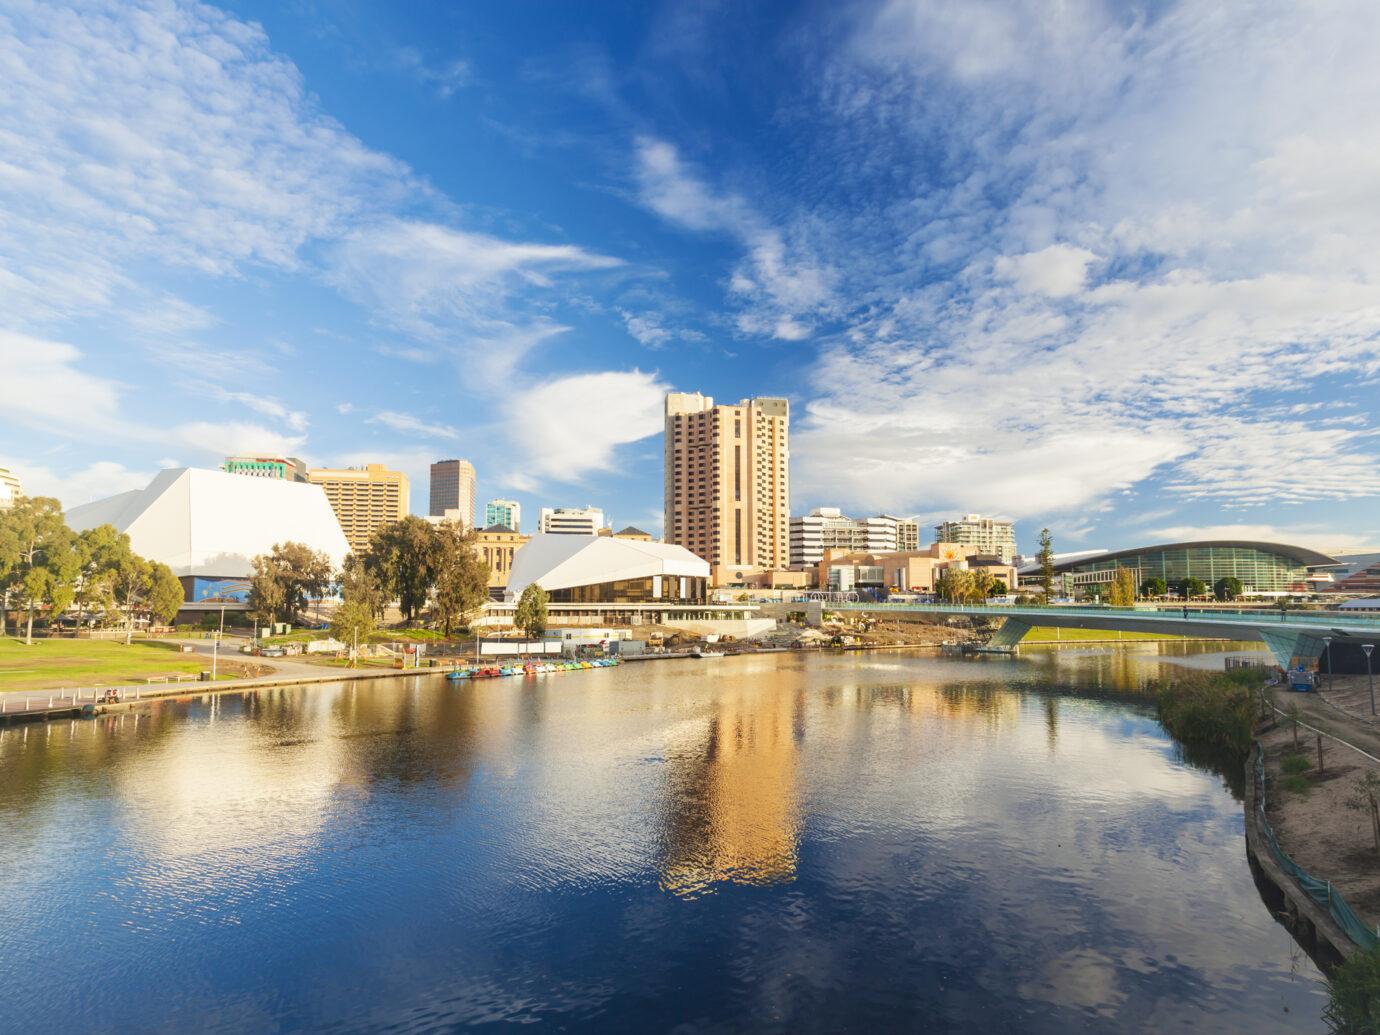 Adelaide city centre across the River Torrens